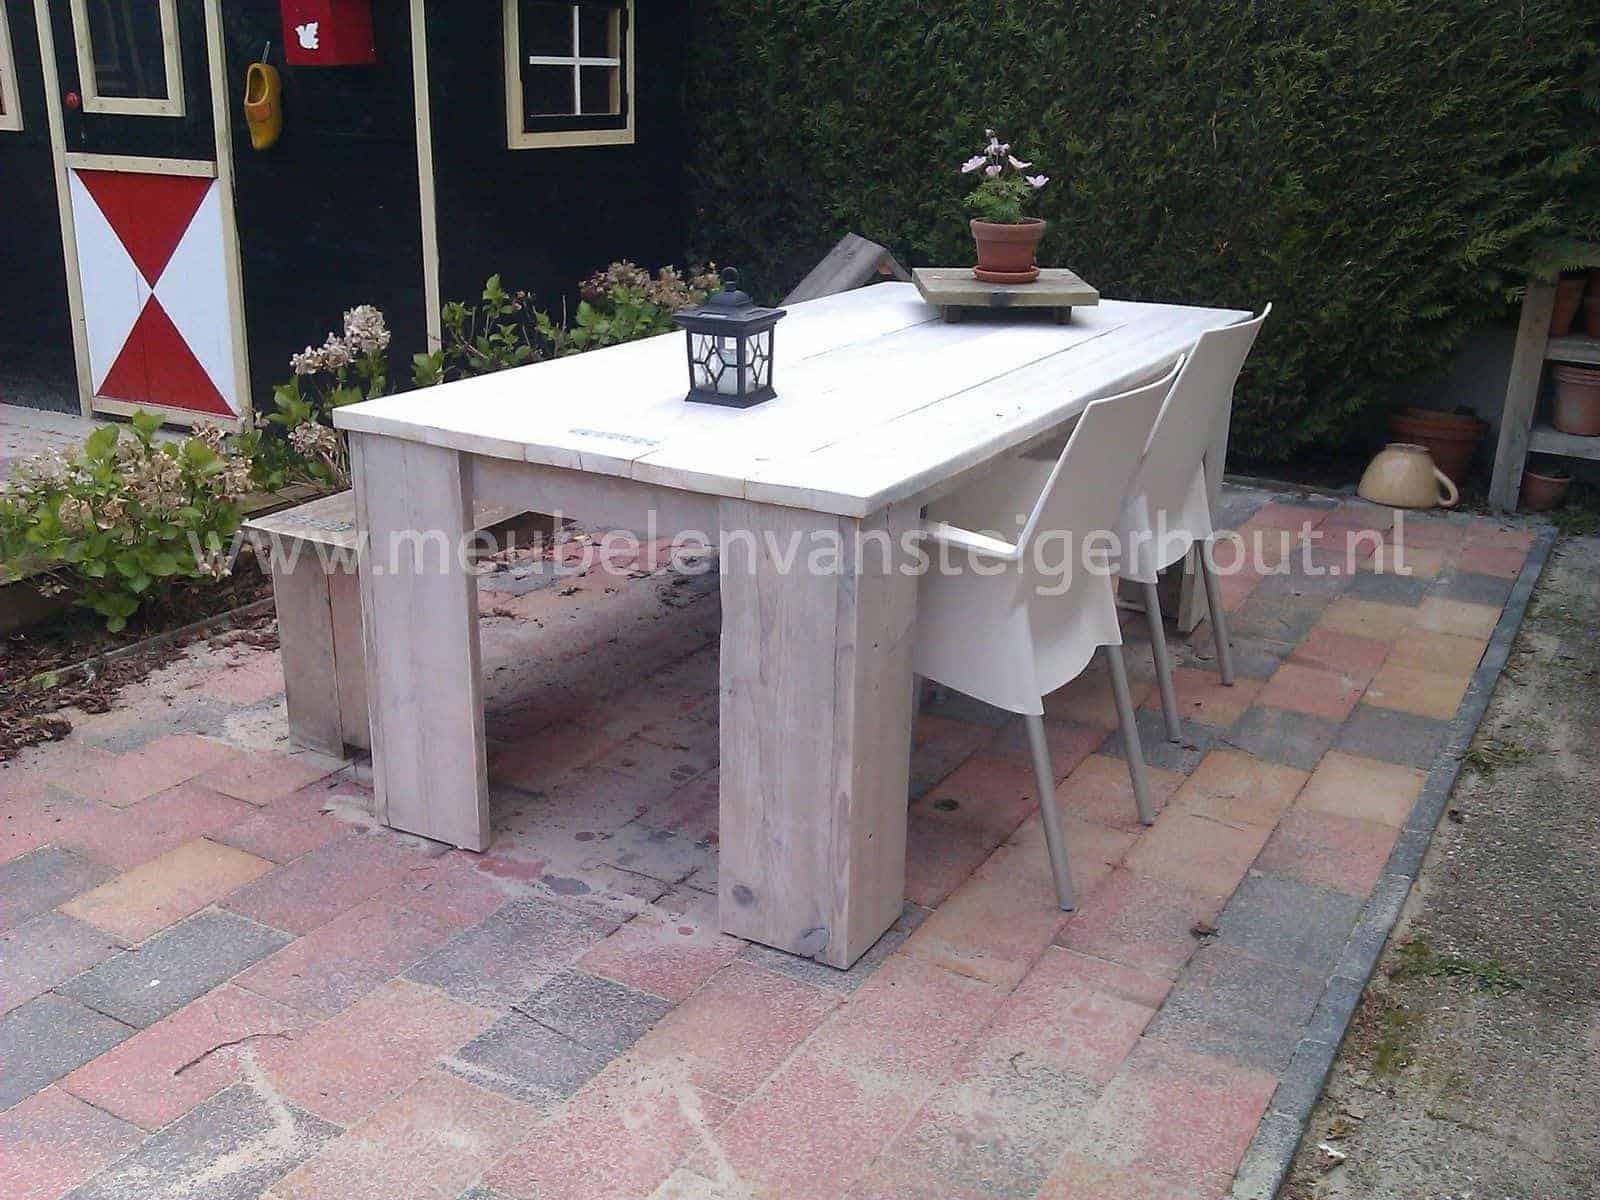 Steigerhout kloostertafel bouwpakket met montagemateriaal en